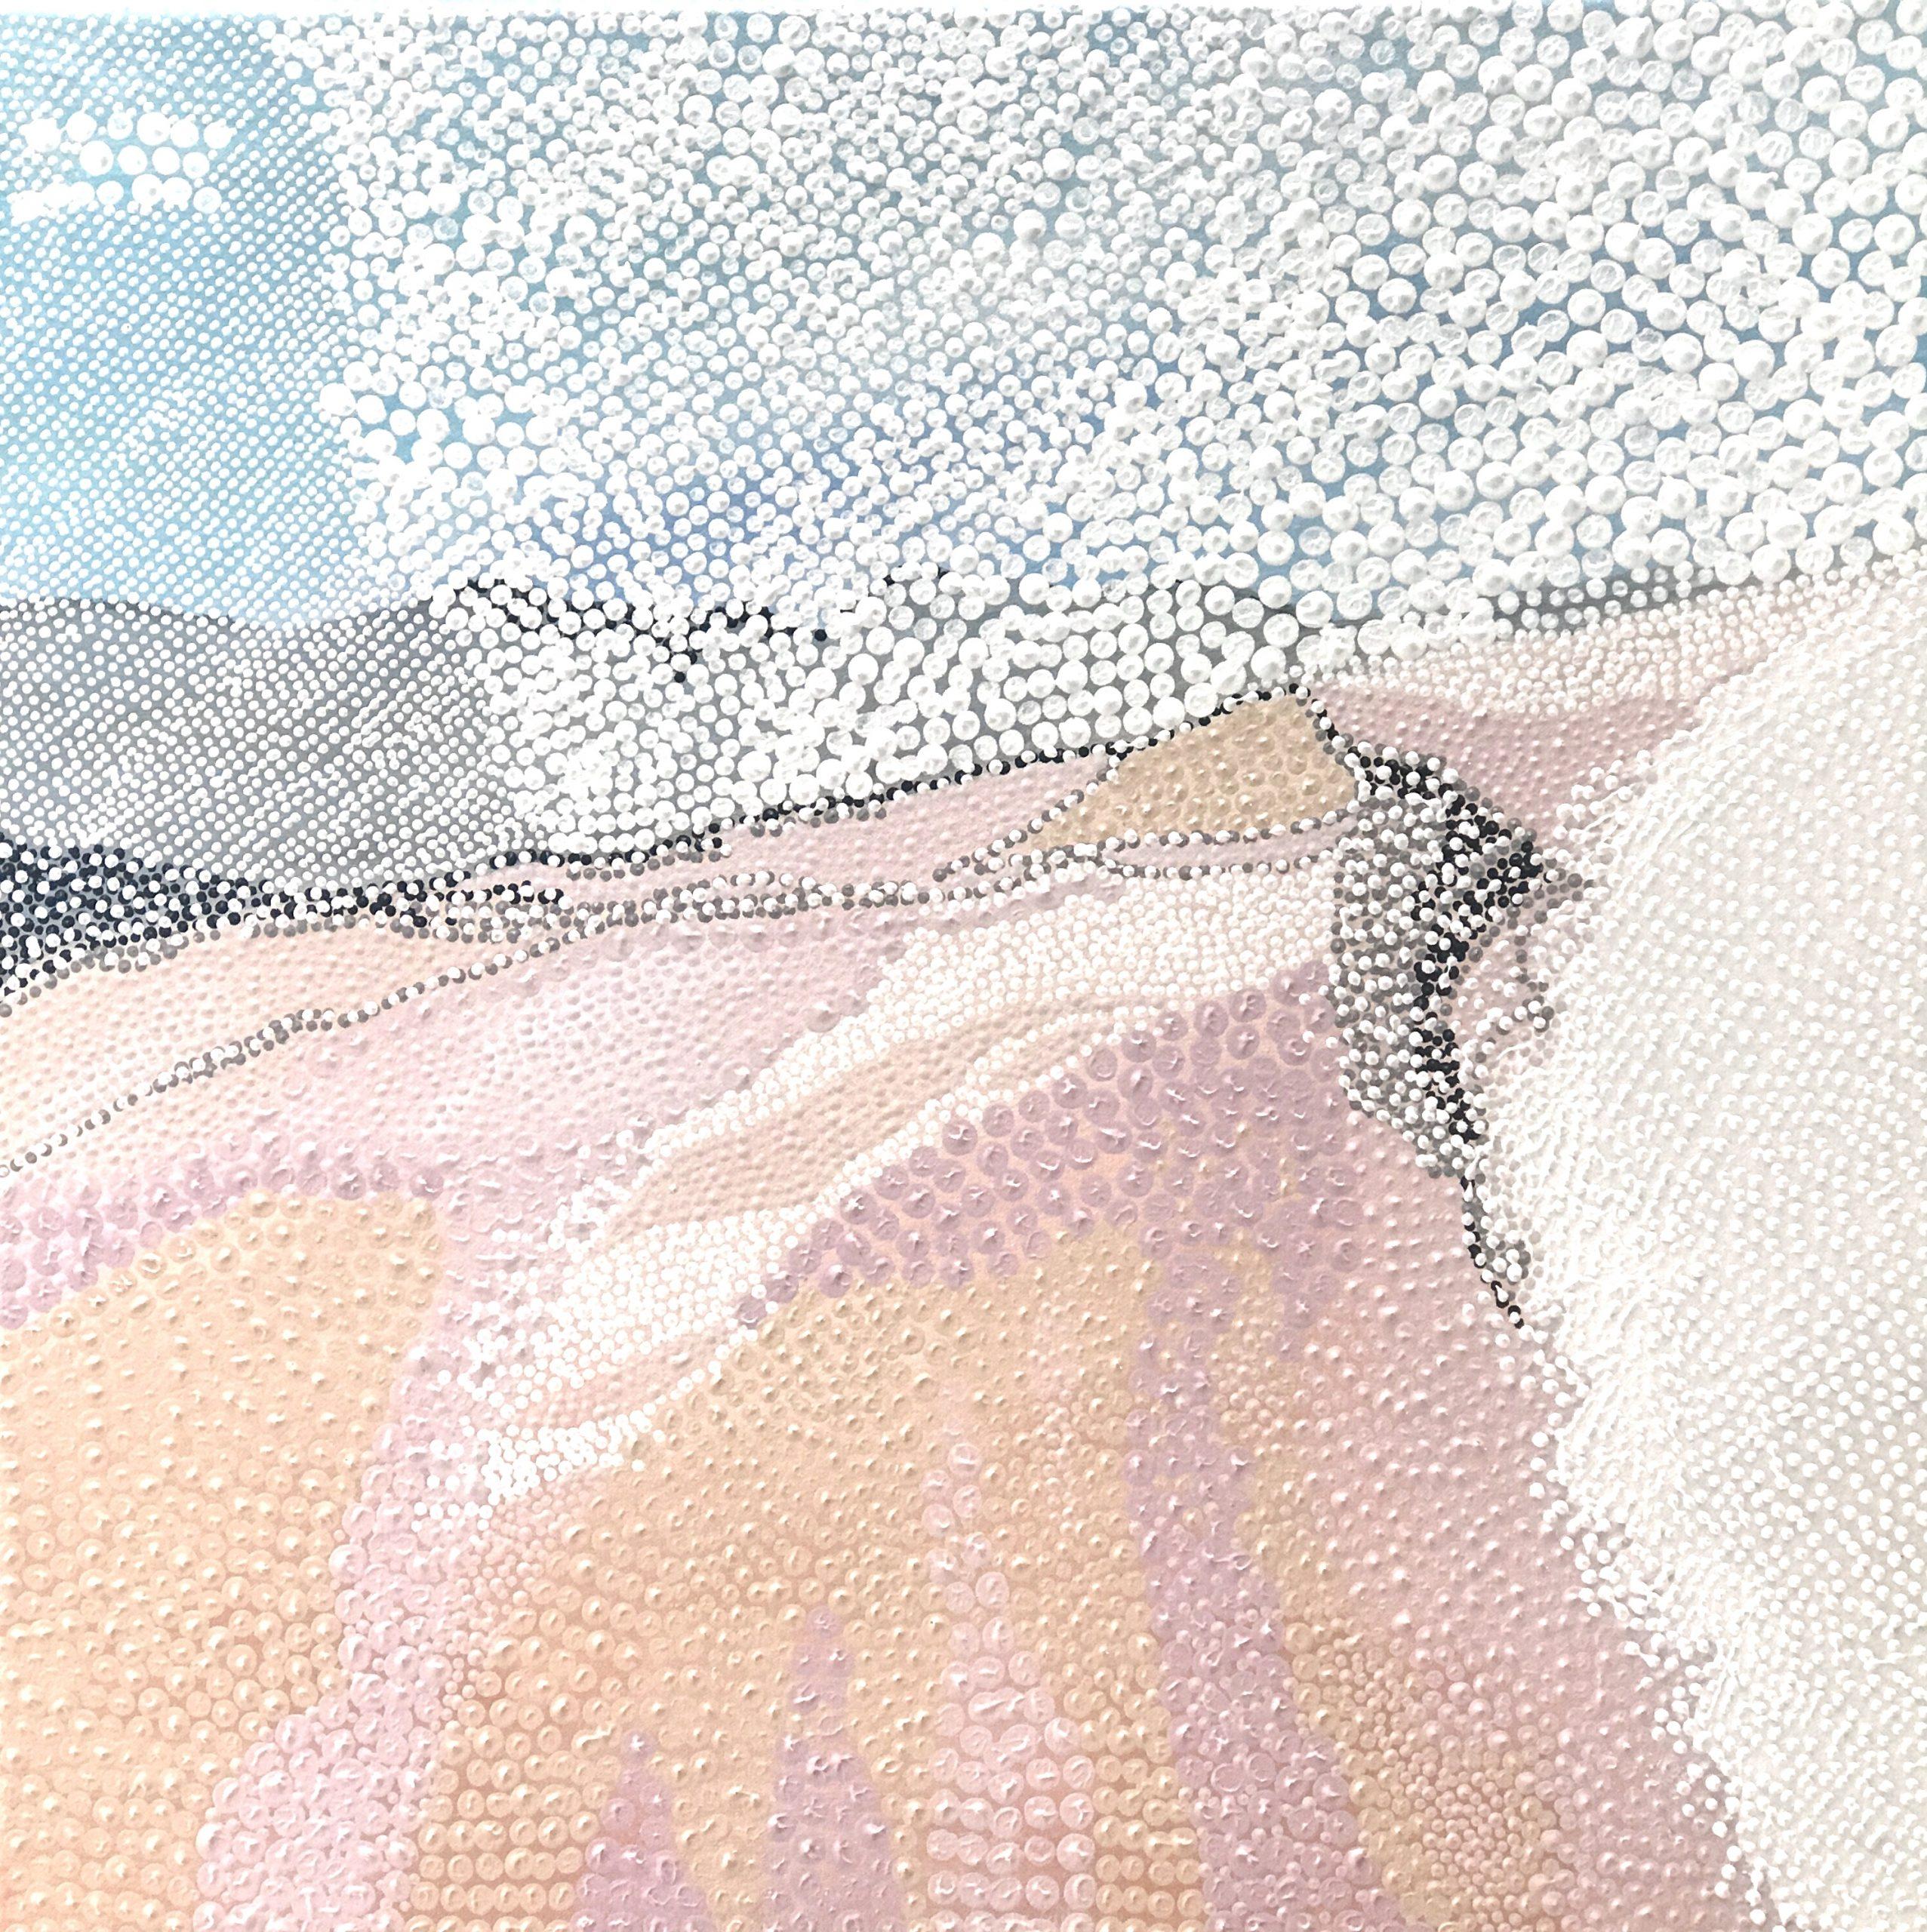 Ngura Tallowsbeach Aug20 (60×60)